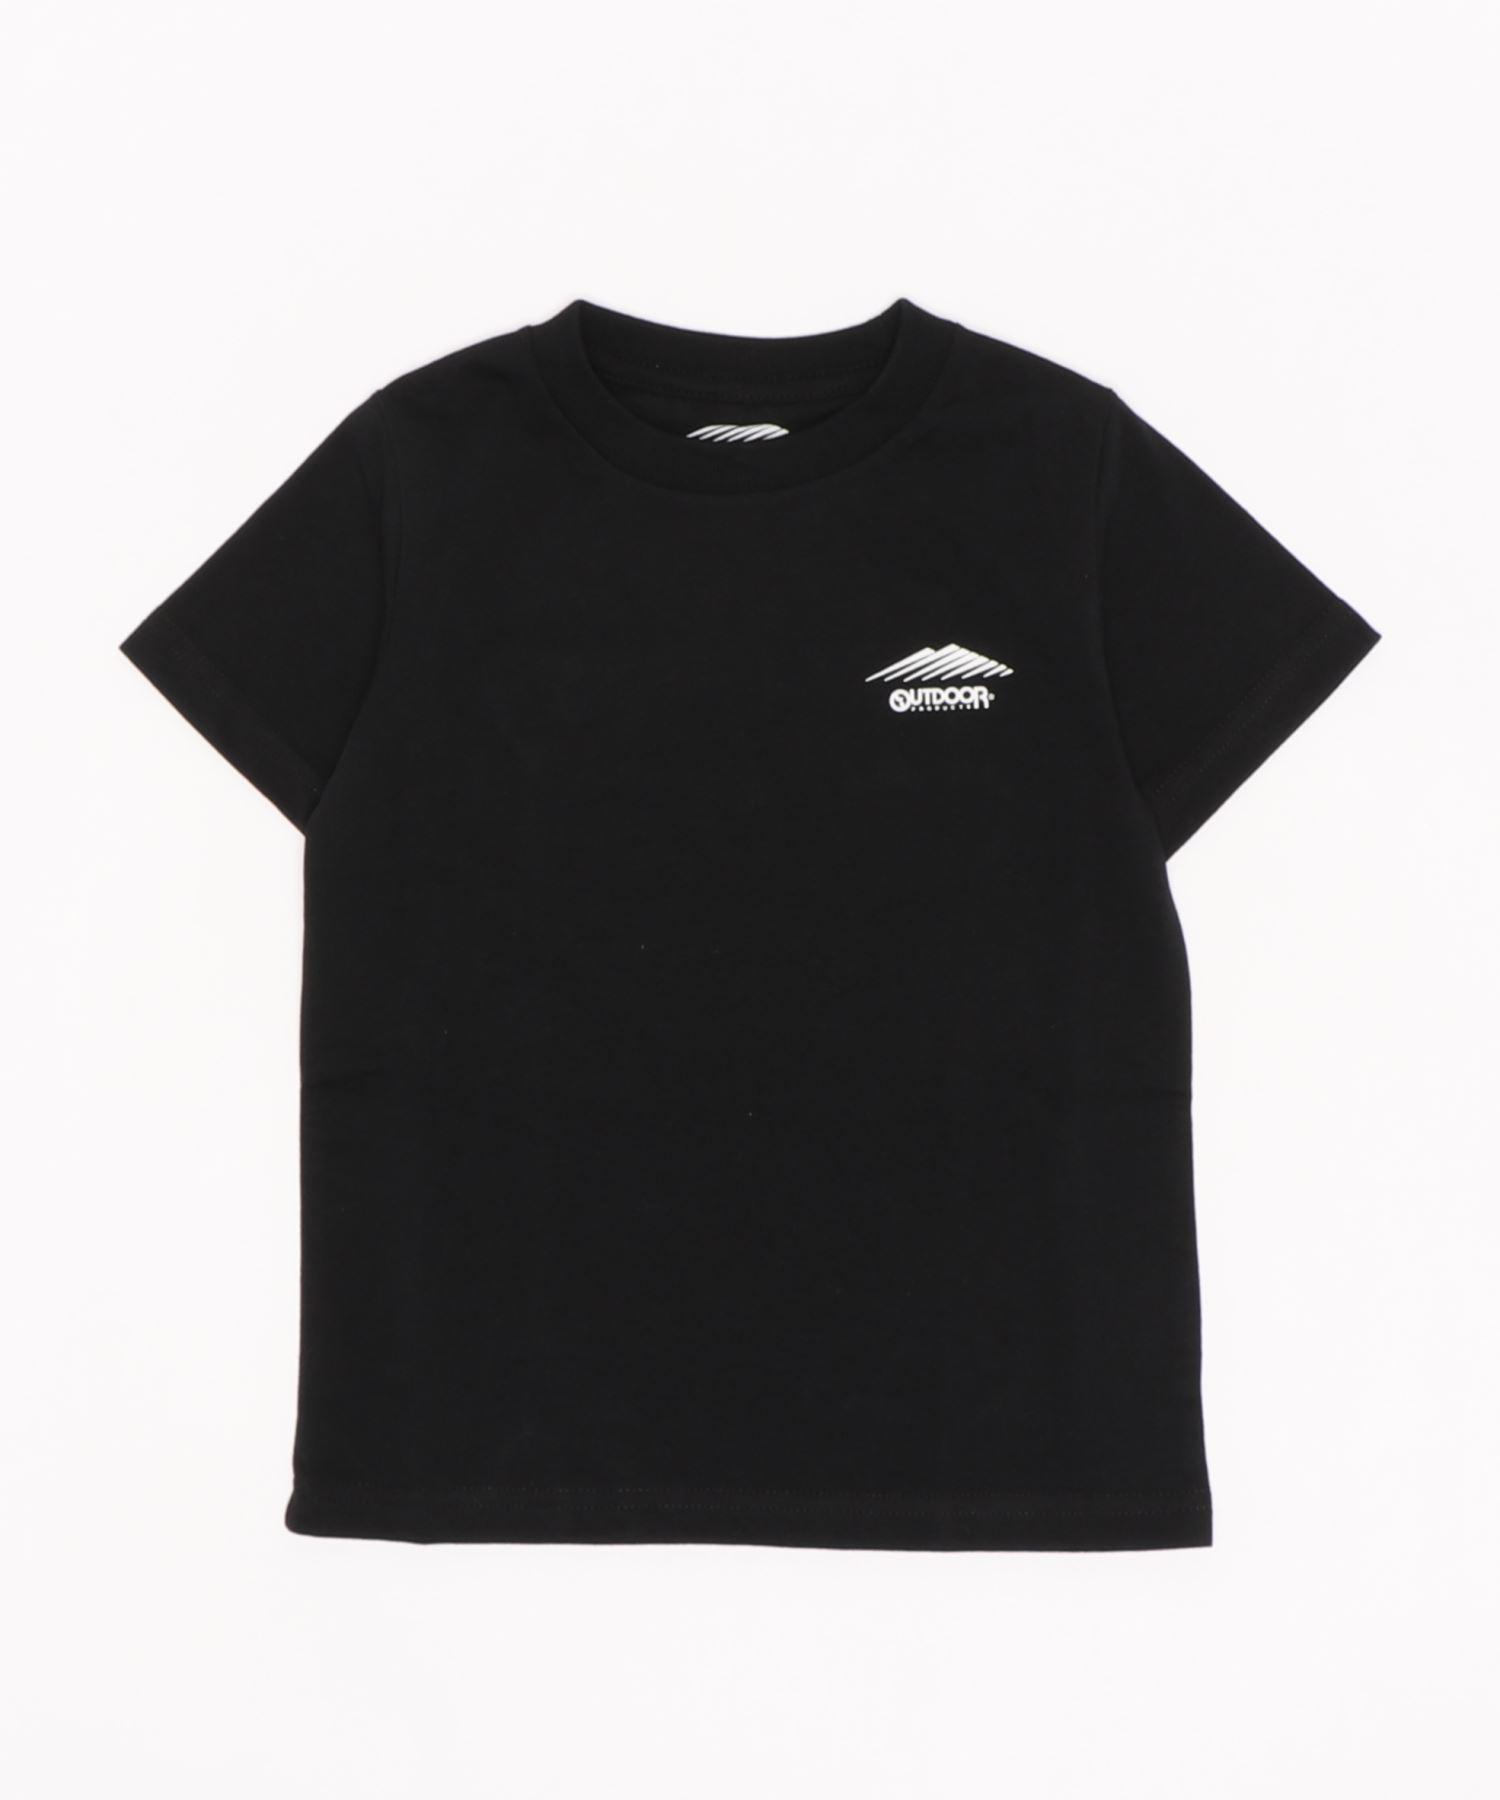 DRY加工(速乾機能) キッズ ワンポイントブランドロゴ入り Tシャツ